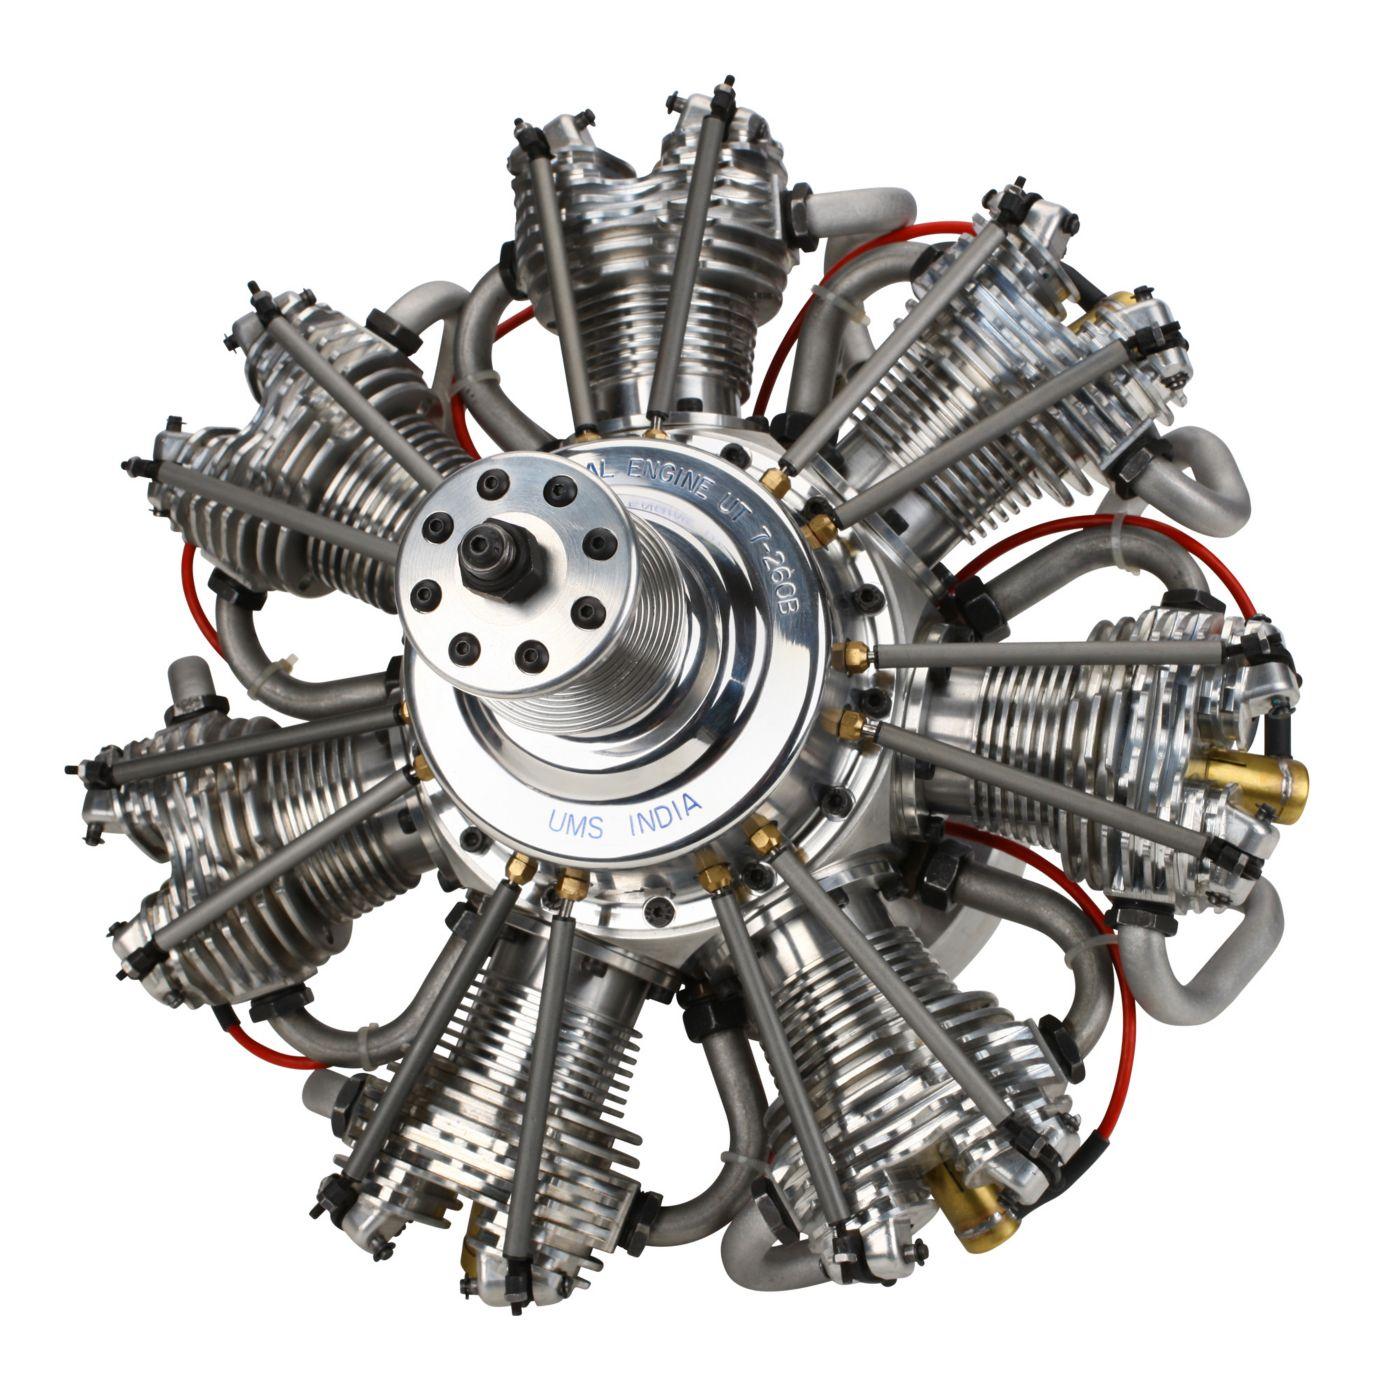 7 Cylinder 260cc 4 Stroke Gas Radial Engine Horizonhobby